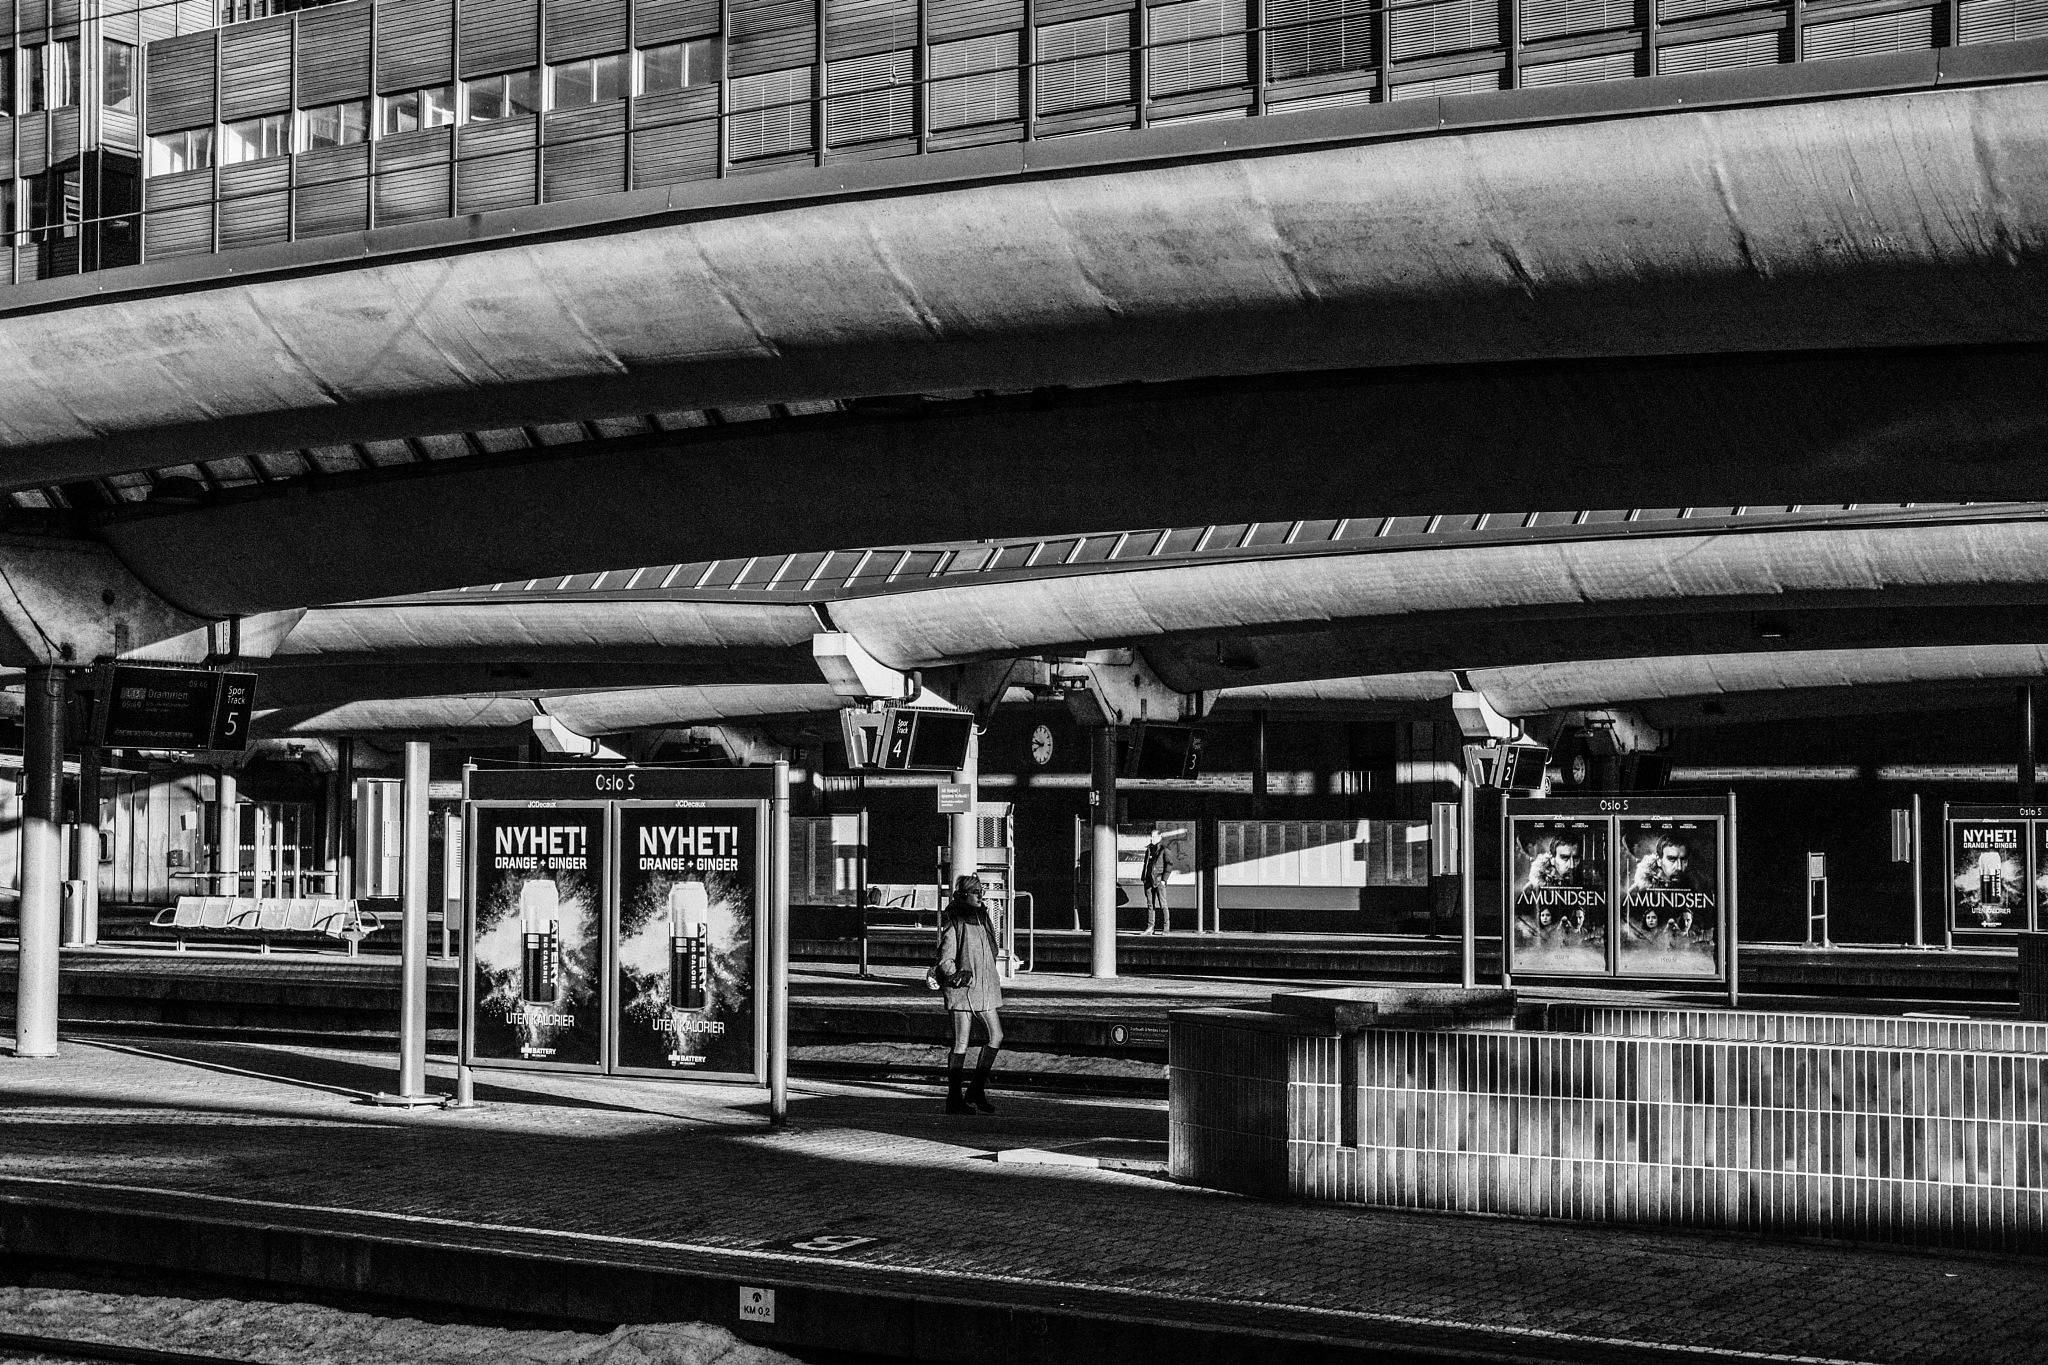 Lonely Commuters by Goran Jorganovich